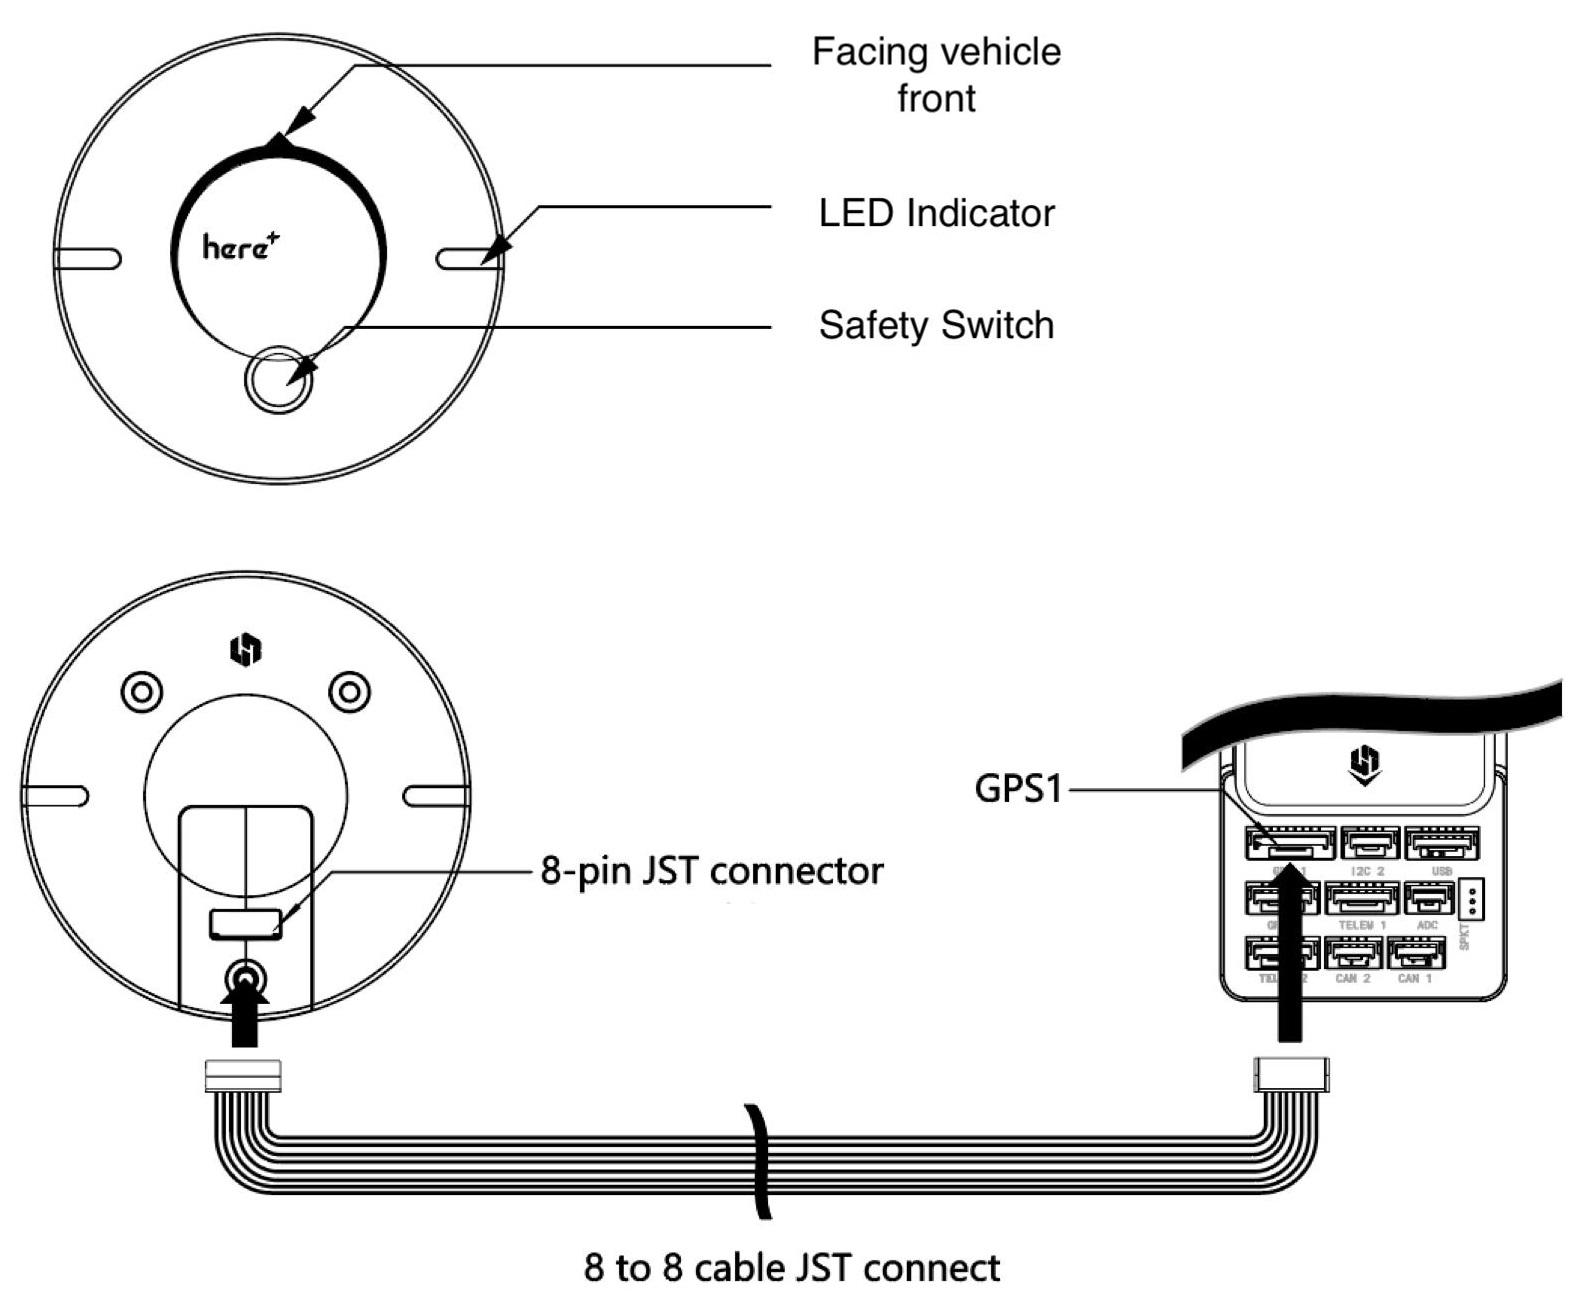 Cube Wiring Quickstart Px4 V1 9 0 User Guide